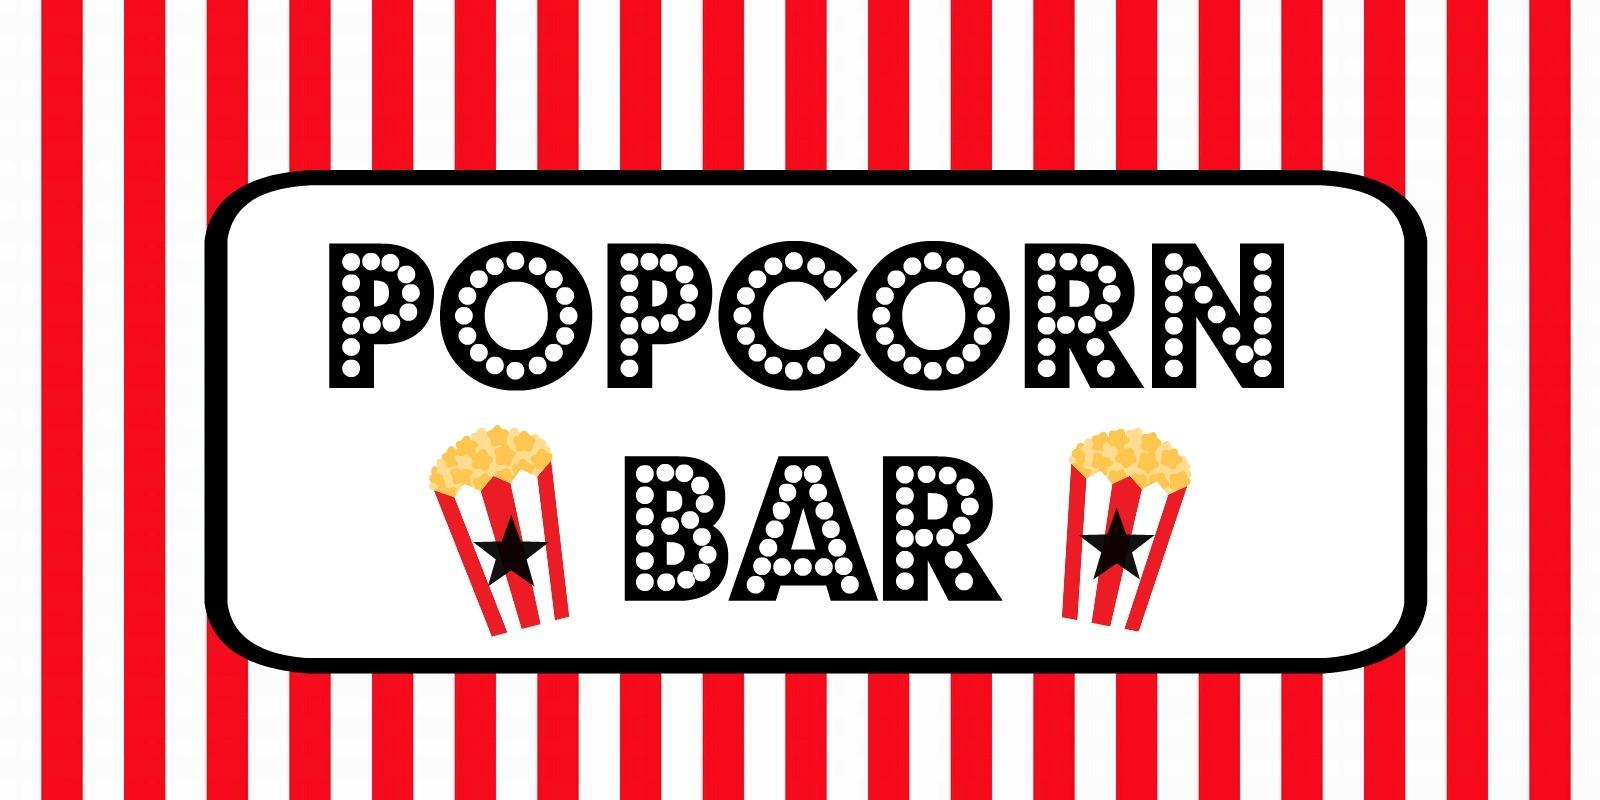 Free Movie Night / Popcorn Bar Printables - Popcorn Bar Free Printables